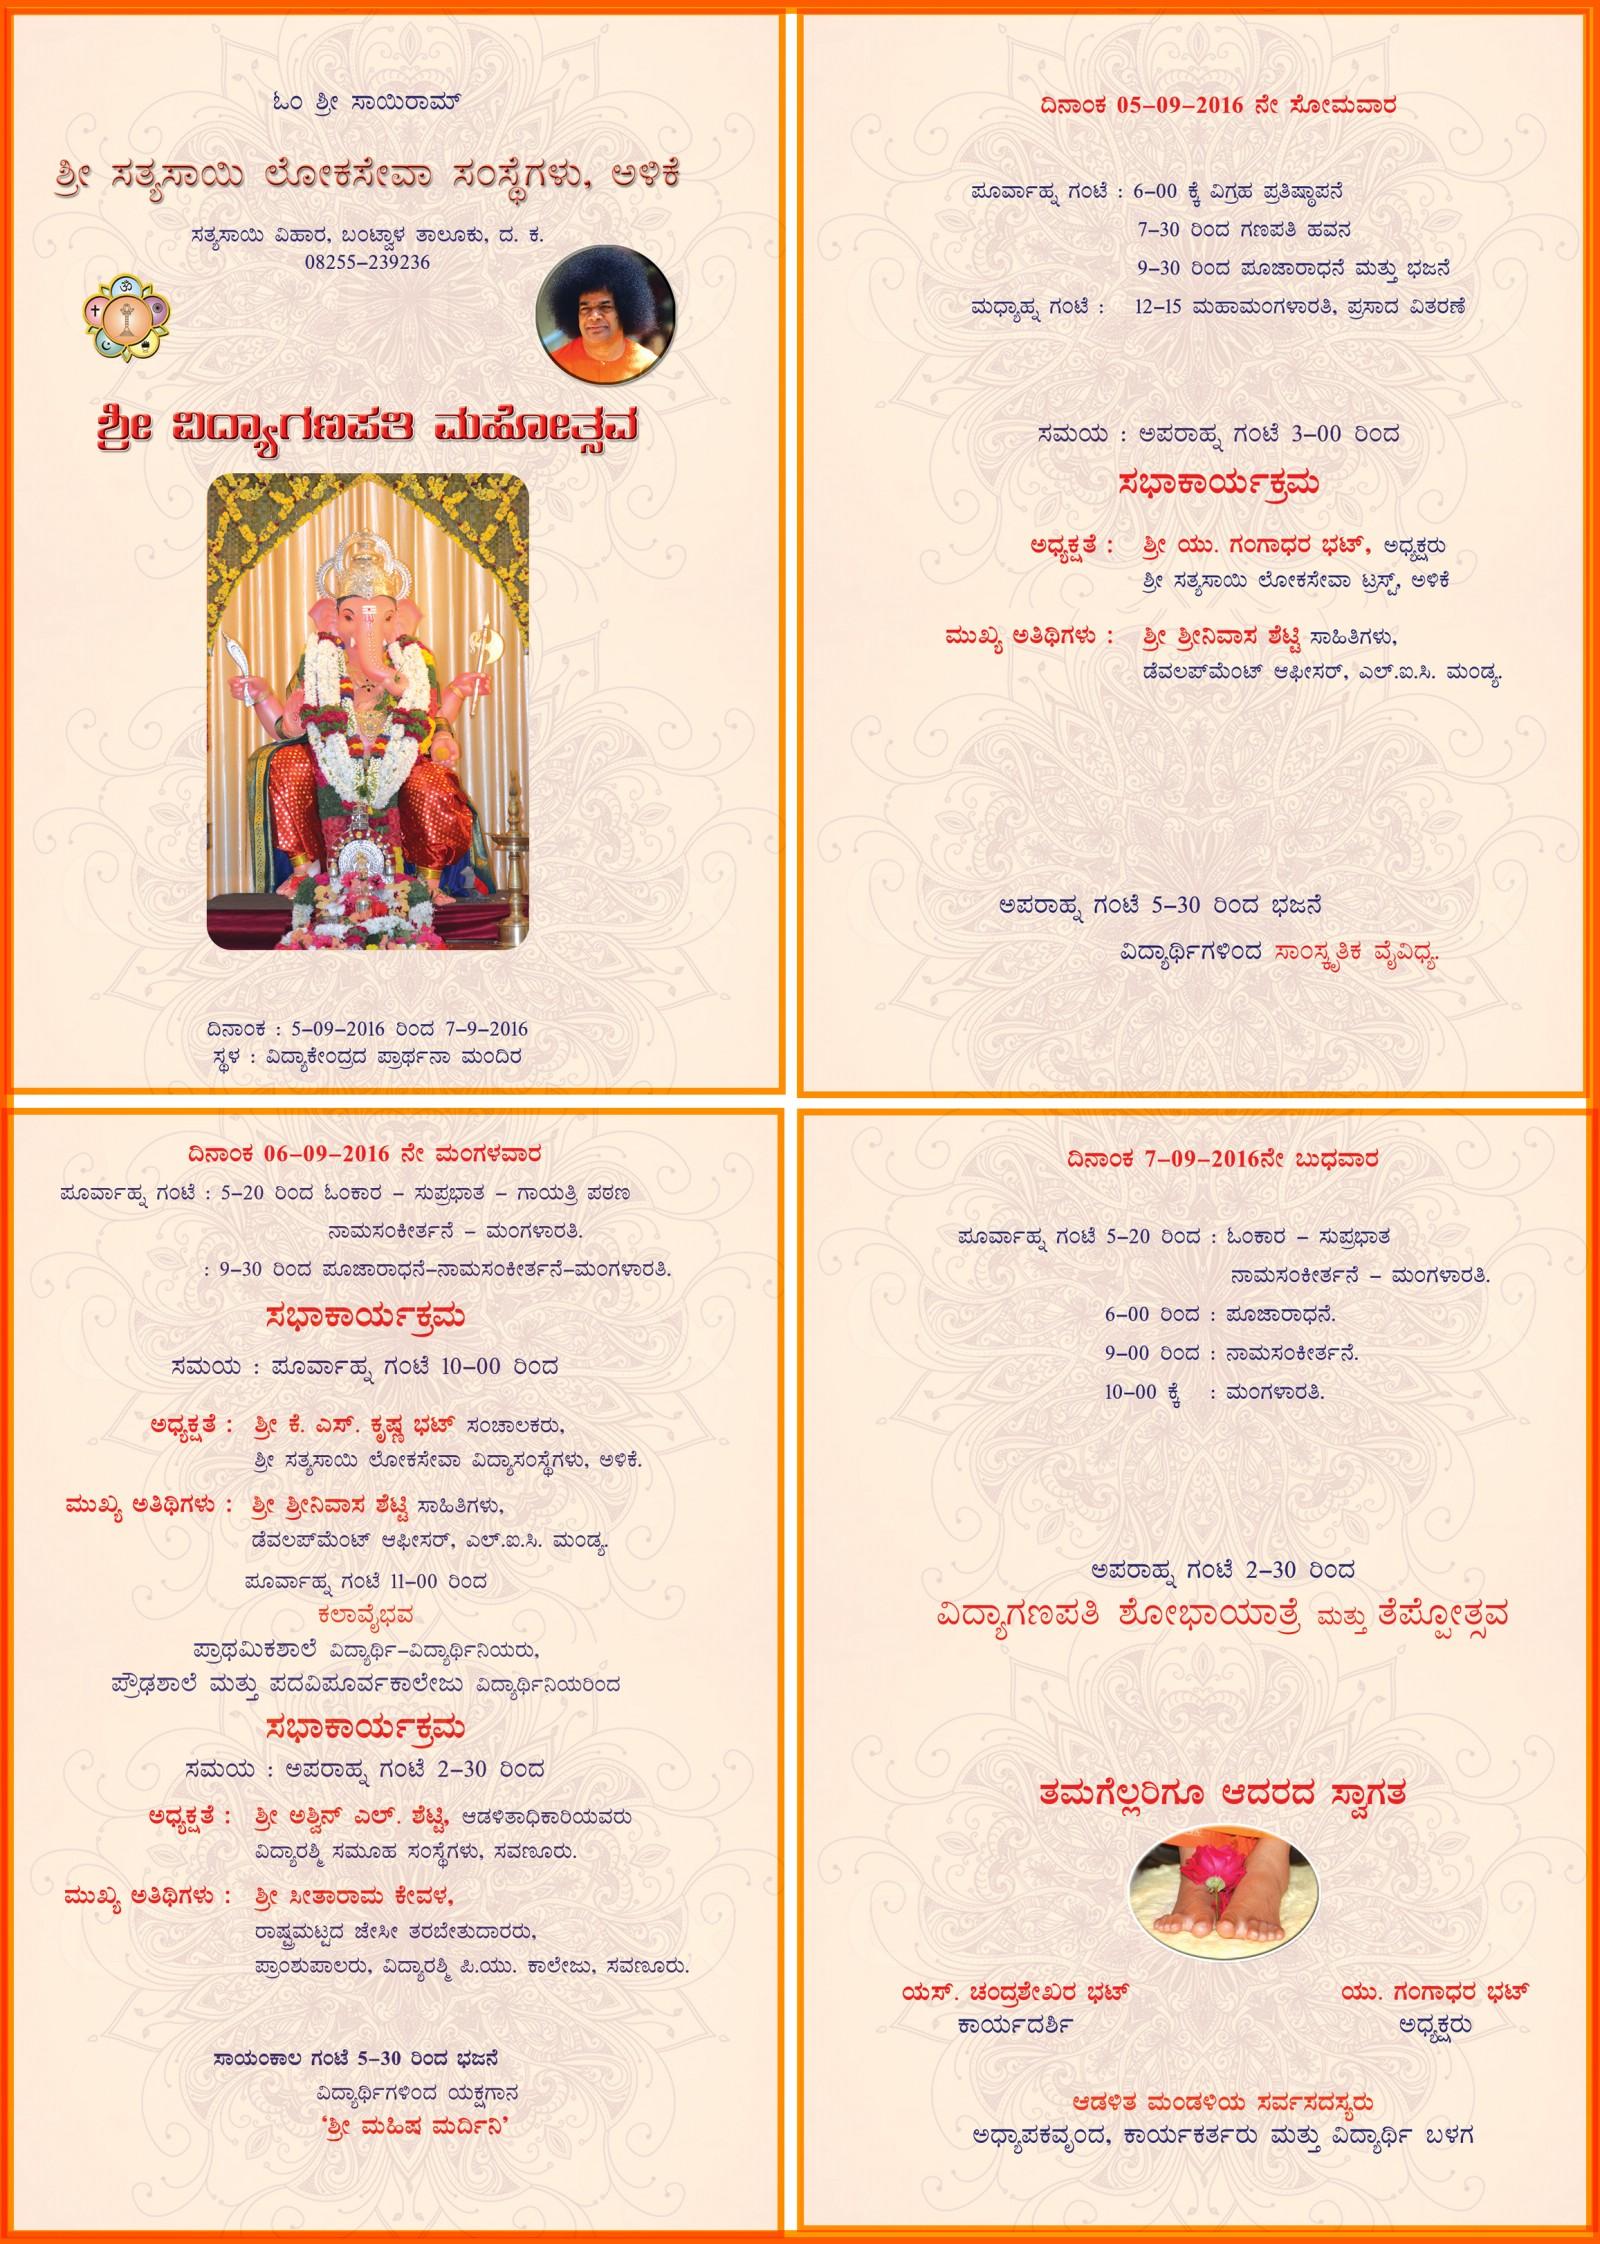 Ganesh Festival Invitation 2016